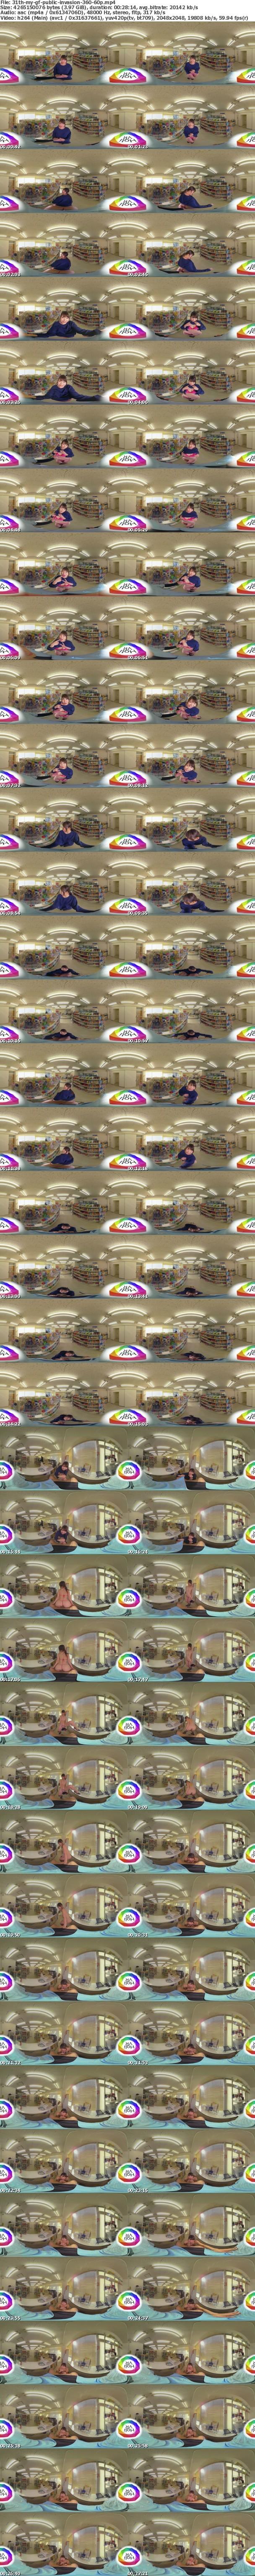 [UnCensored VR] Holivr holi_ep31 My GF Public Invasion Aoi Shino